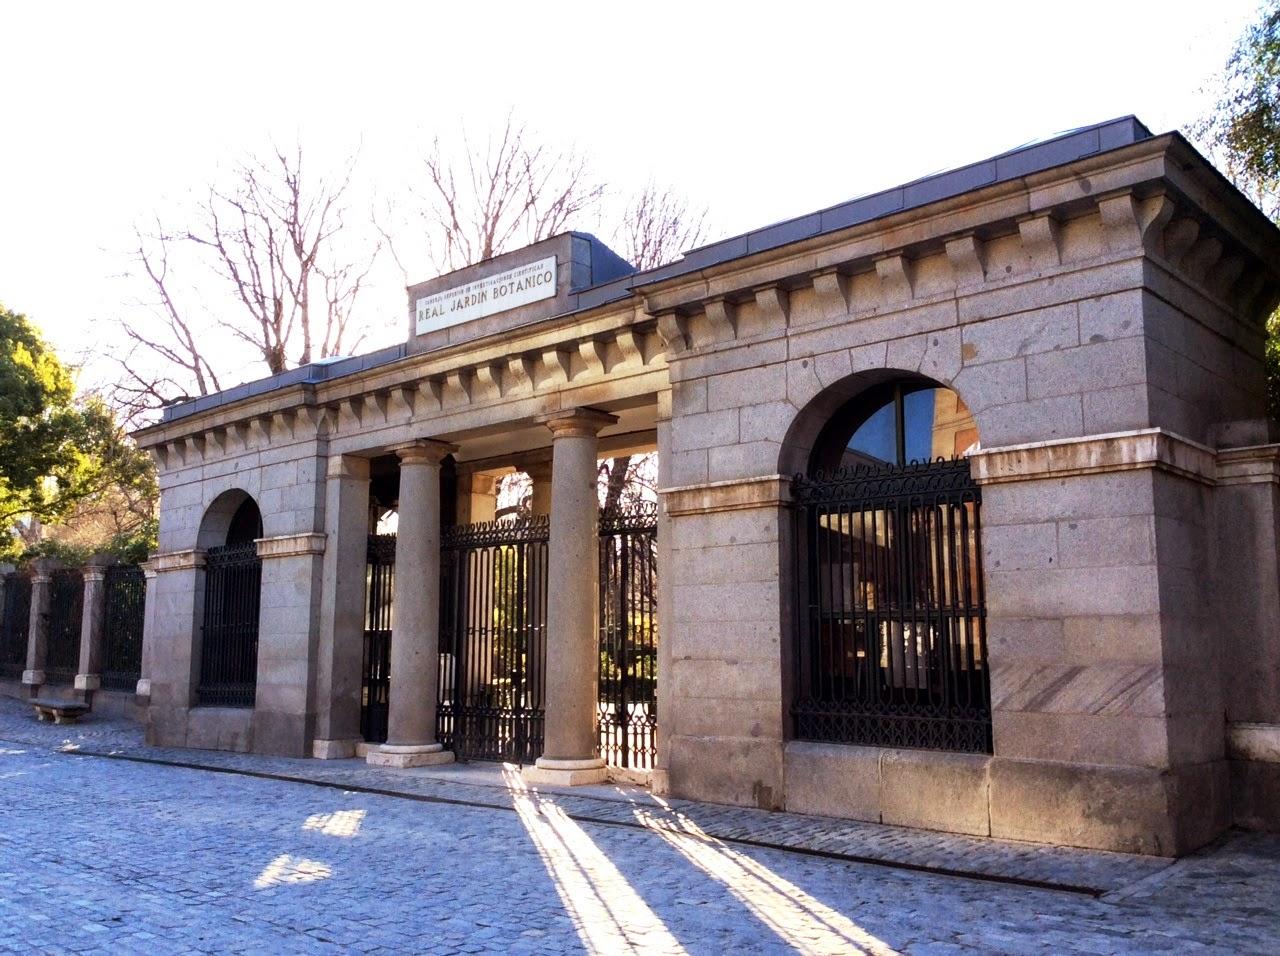 Pasi n por madrid la puerta norte del jard n bot nico for Entrada jardin botanico madrid